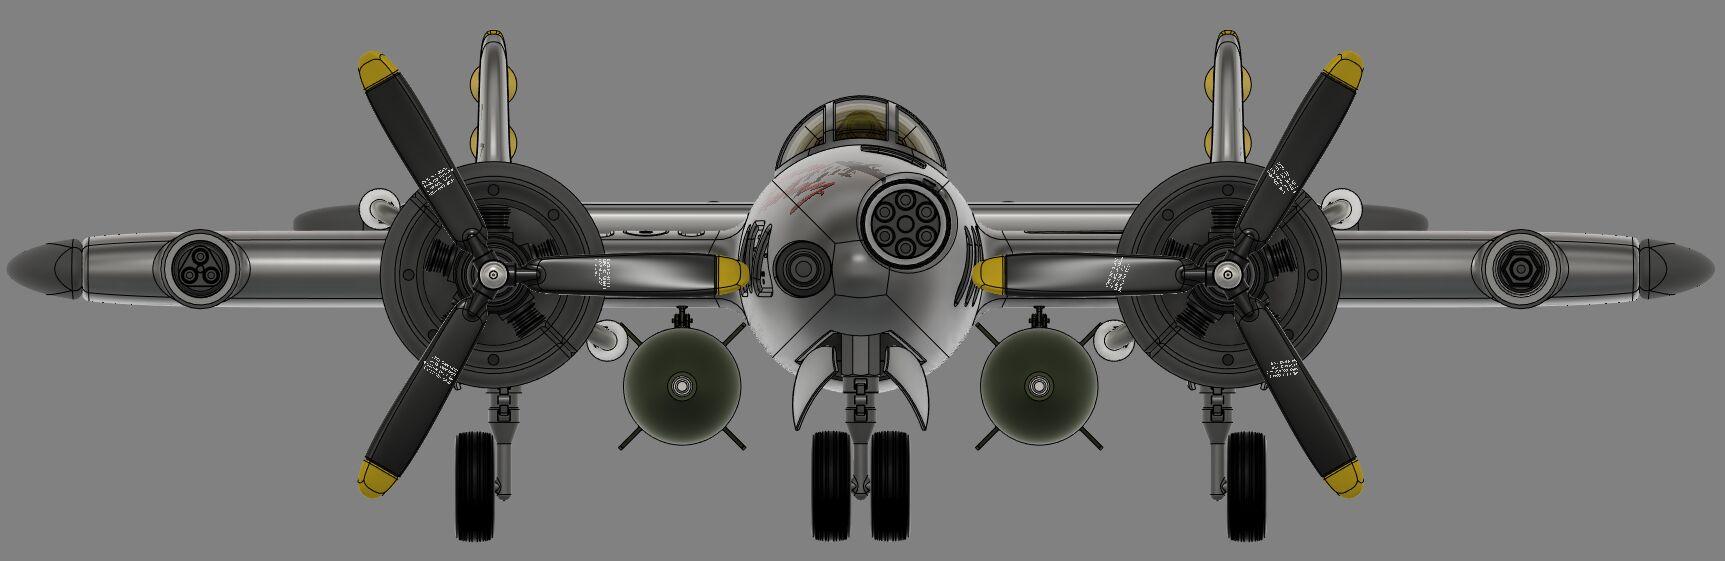 P-38-lightning-08-3500-3500